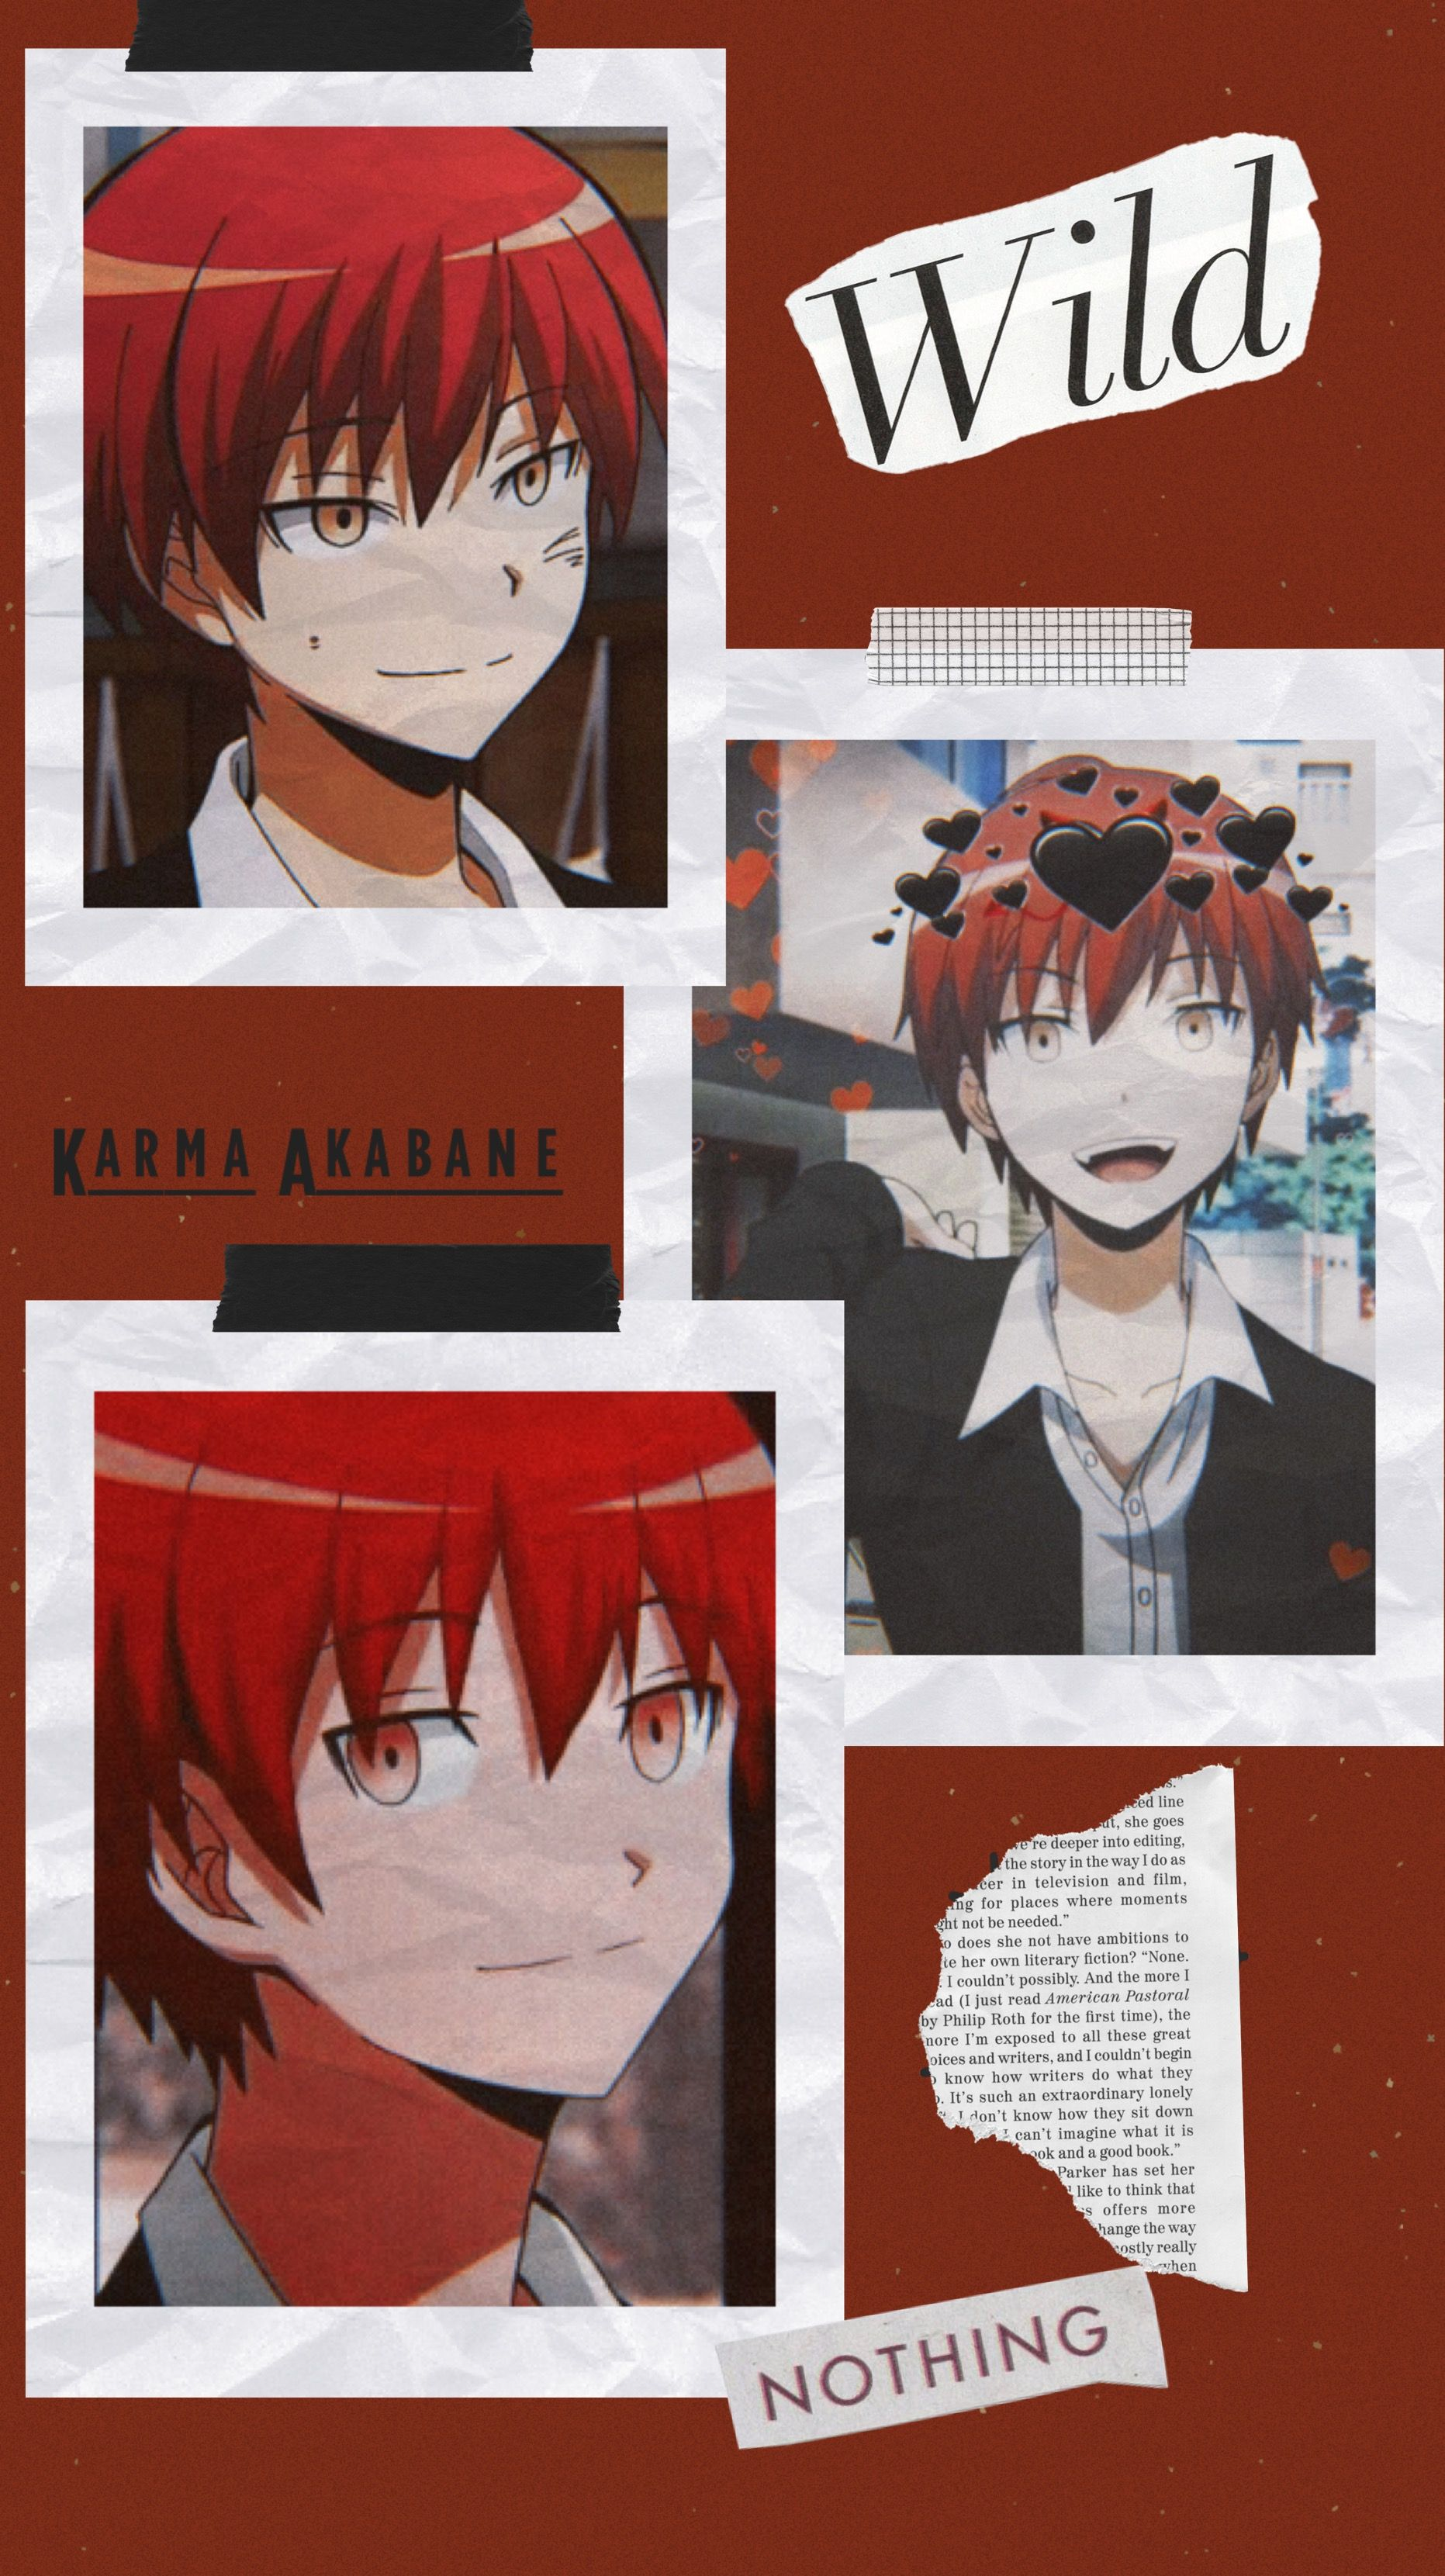 Karma Akabane Lockscreen Karma Akabane Cute Anime Wallpaper Aesthetic Anime Wallpapers